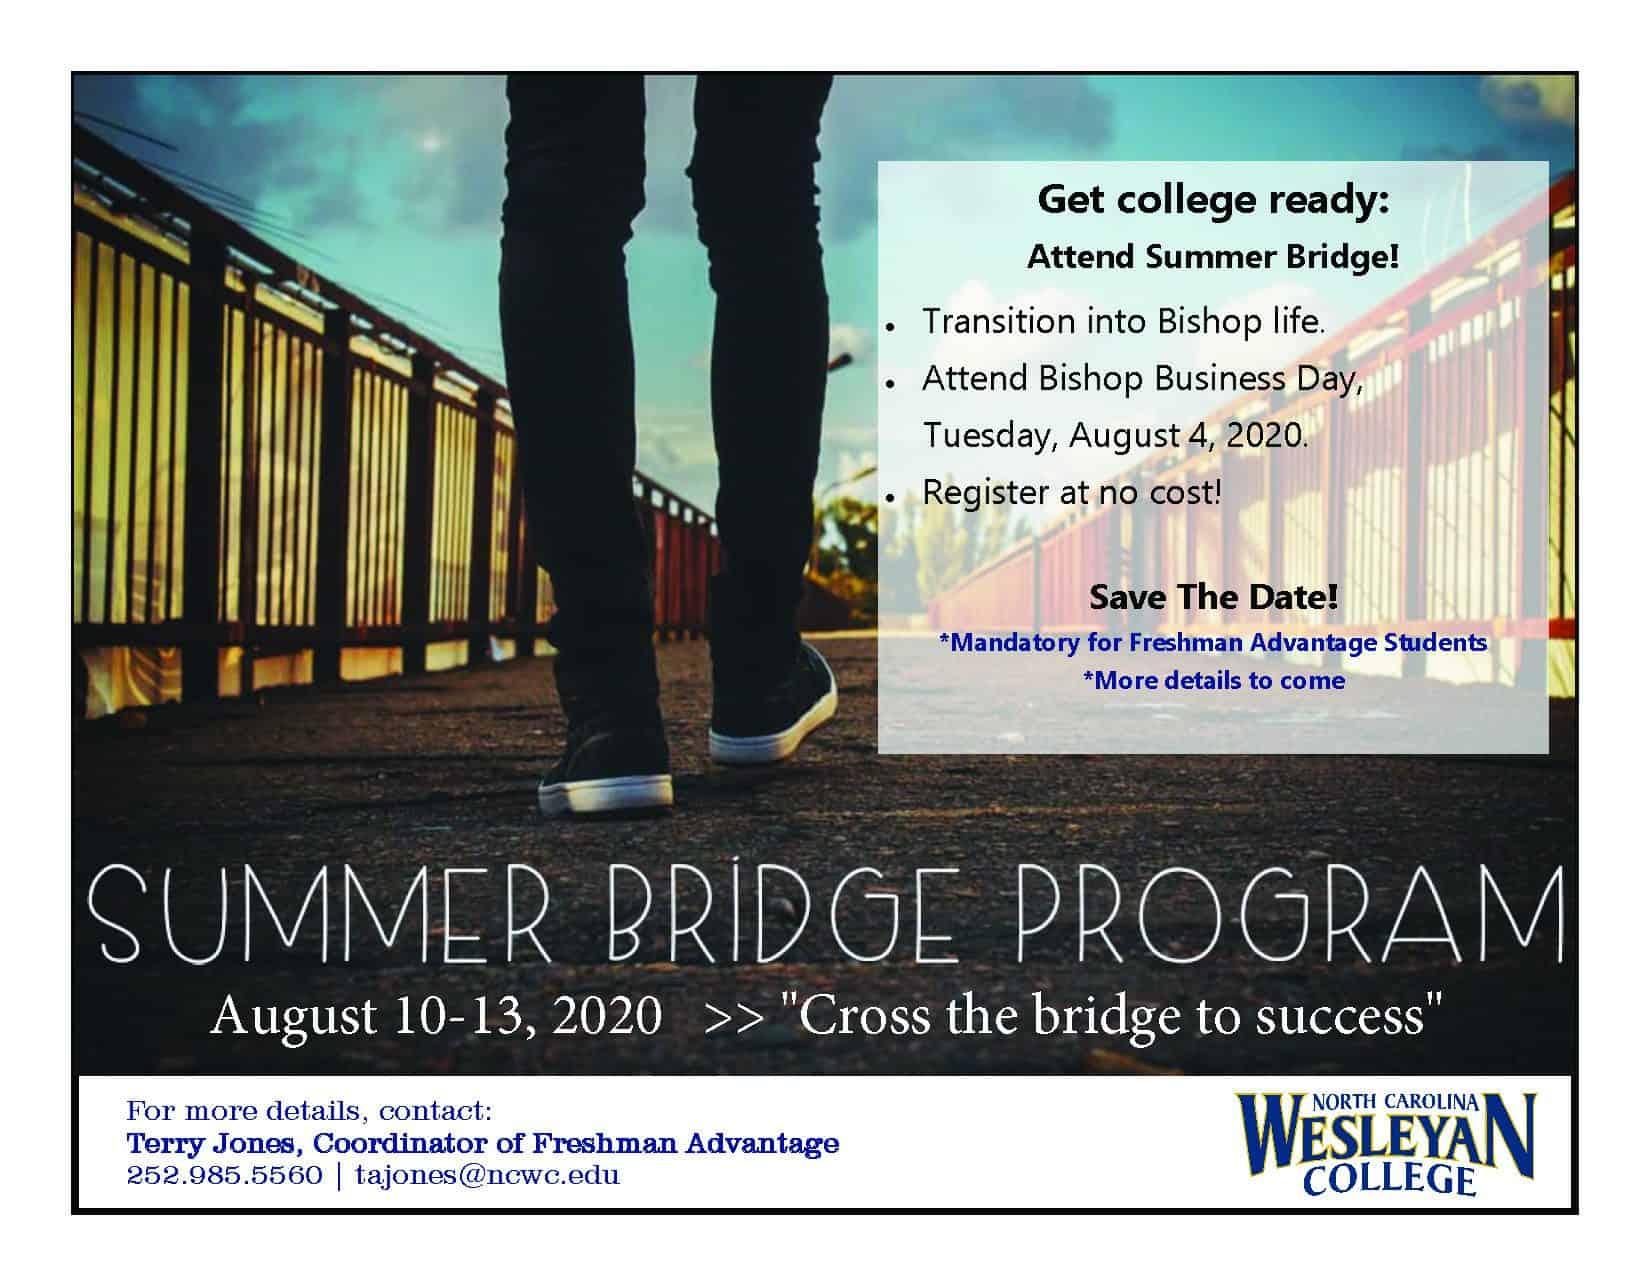 summer bridge preview image